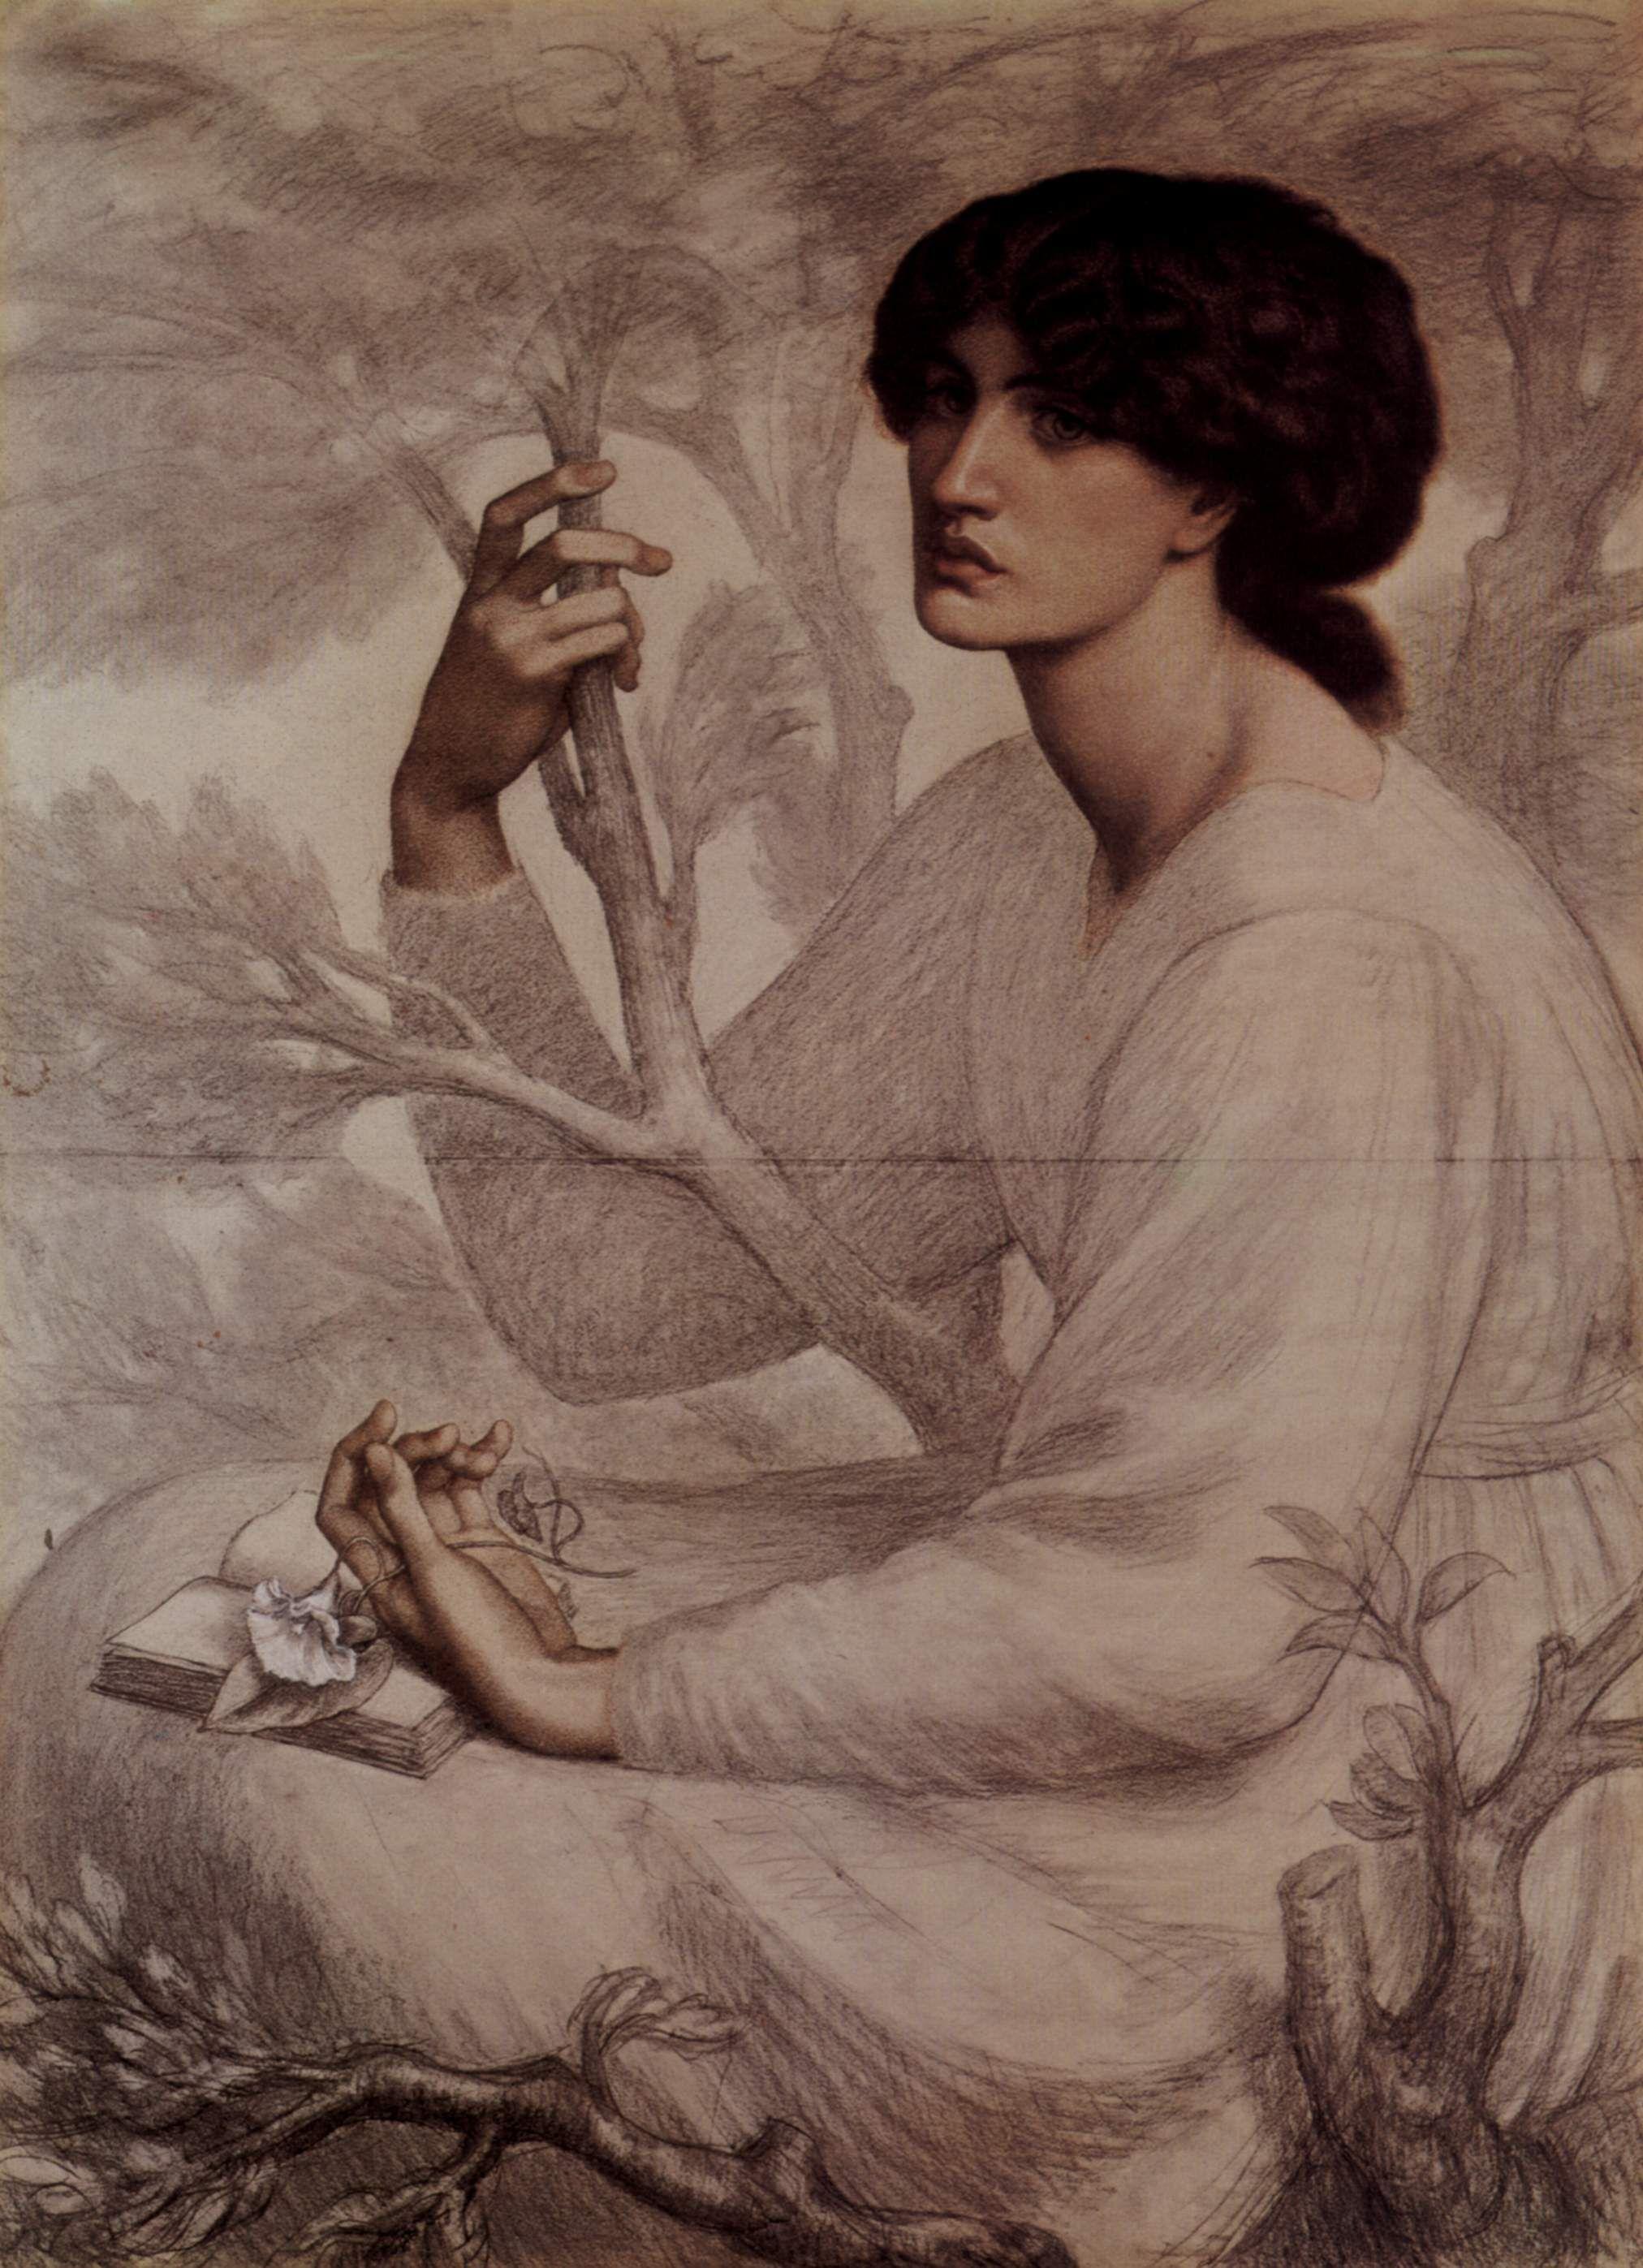 Dante Gabriel Rossetti photo #6977, Dante Gabriel Rossetti image